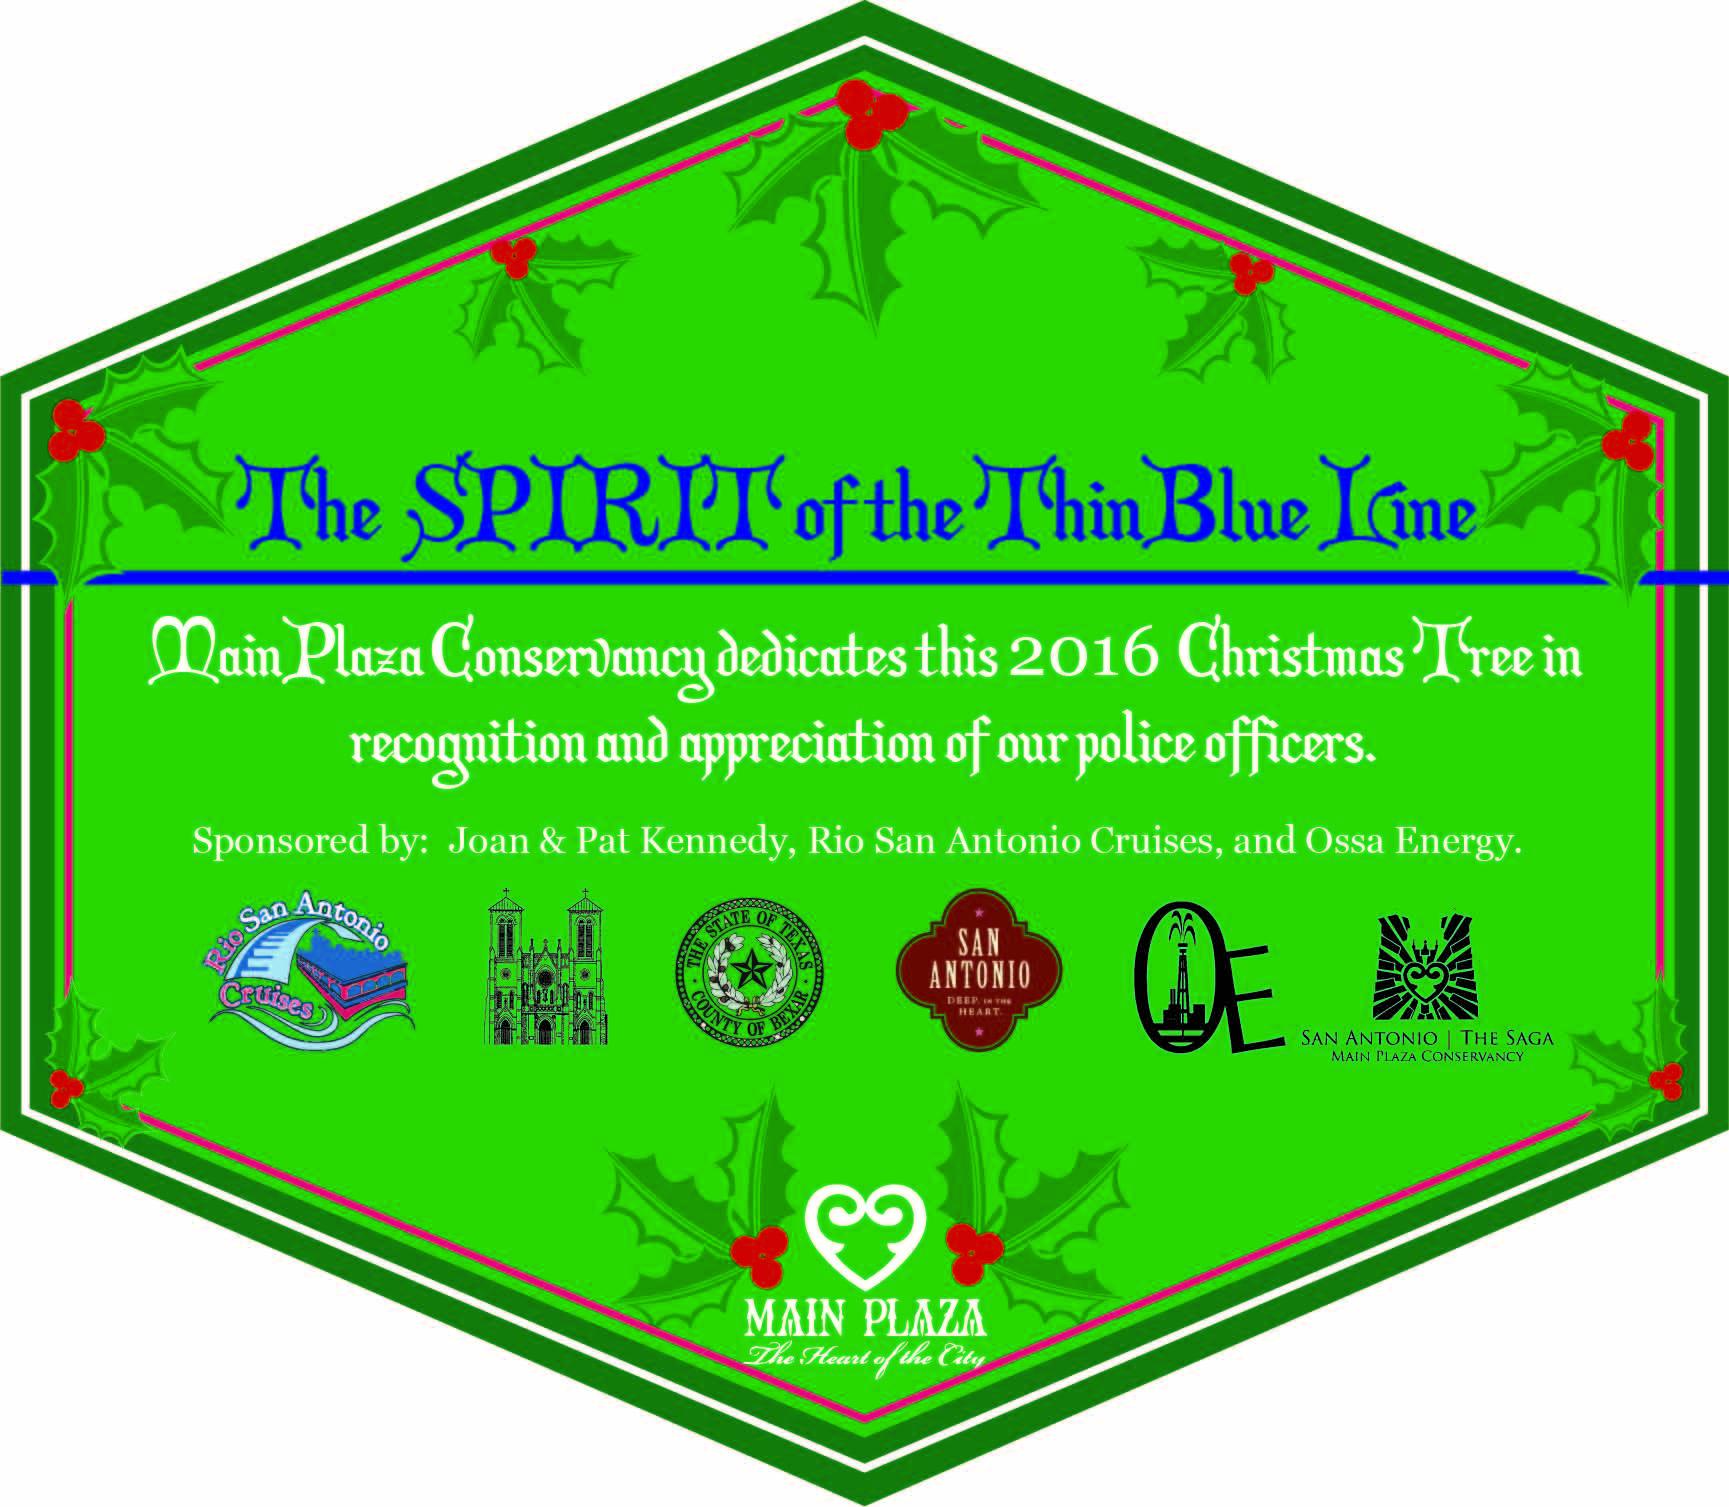 2016 SB-Thin Blue Line